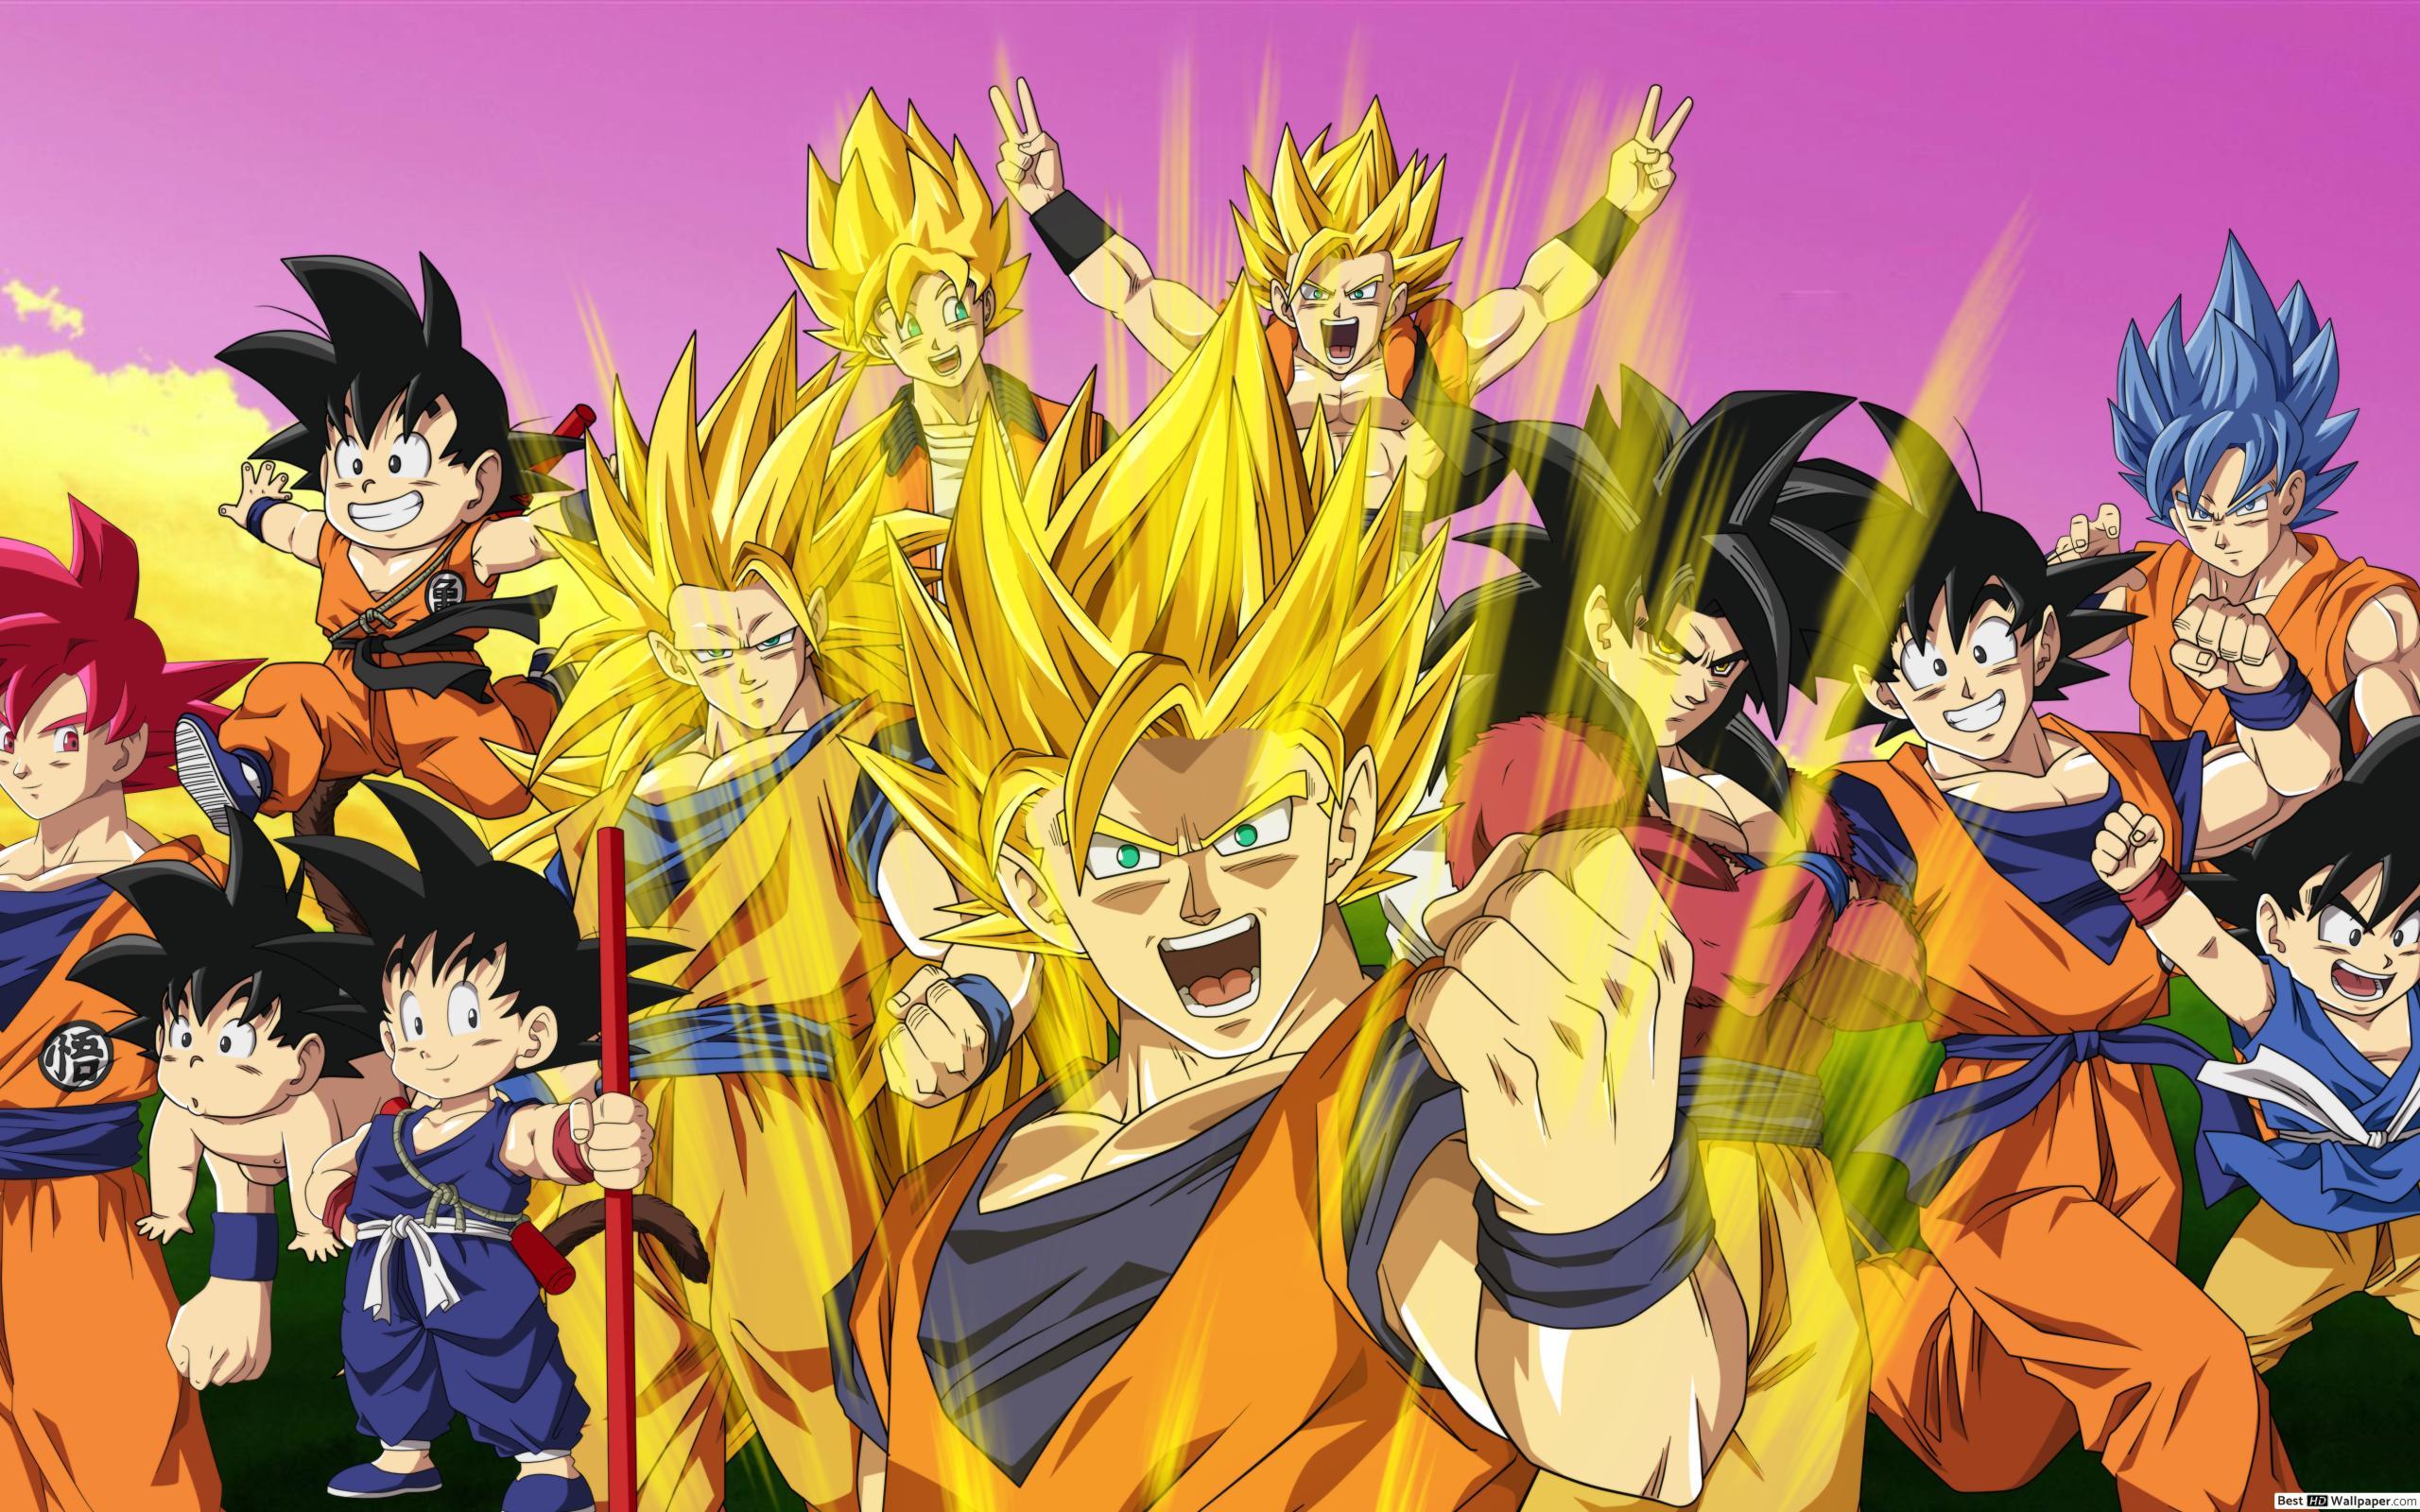 Anime / Dragon Ball Z Hd Fond D'écran Télécharger tout Dessin Animé De Dragon Ball Z